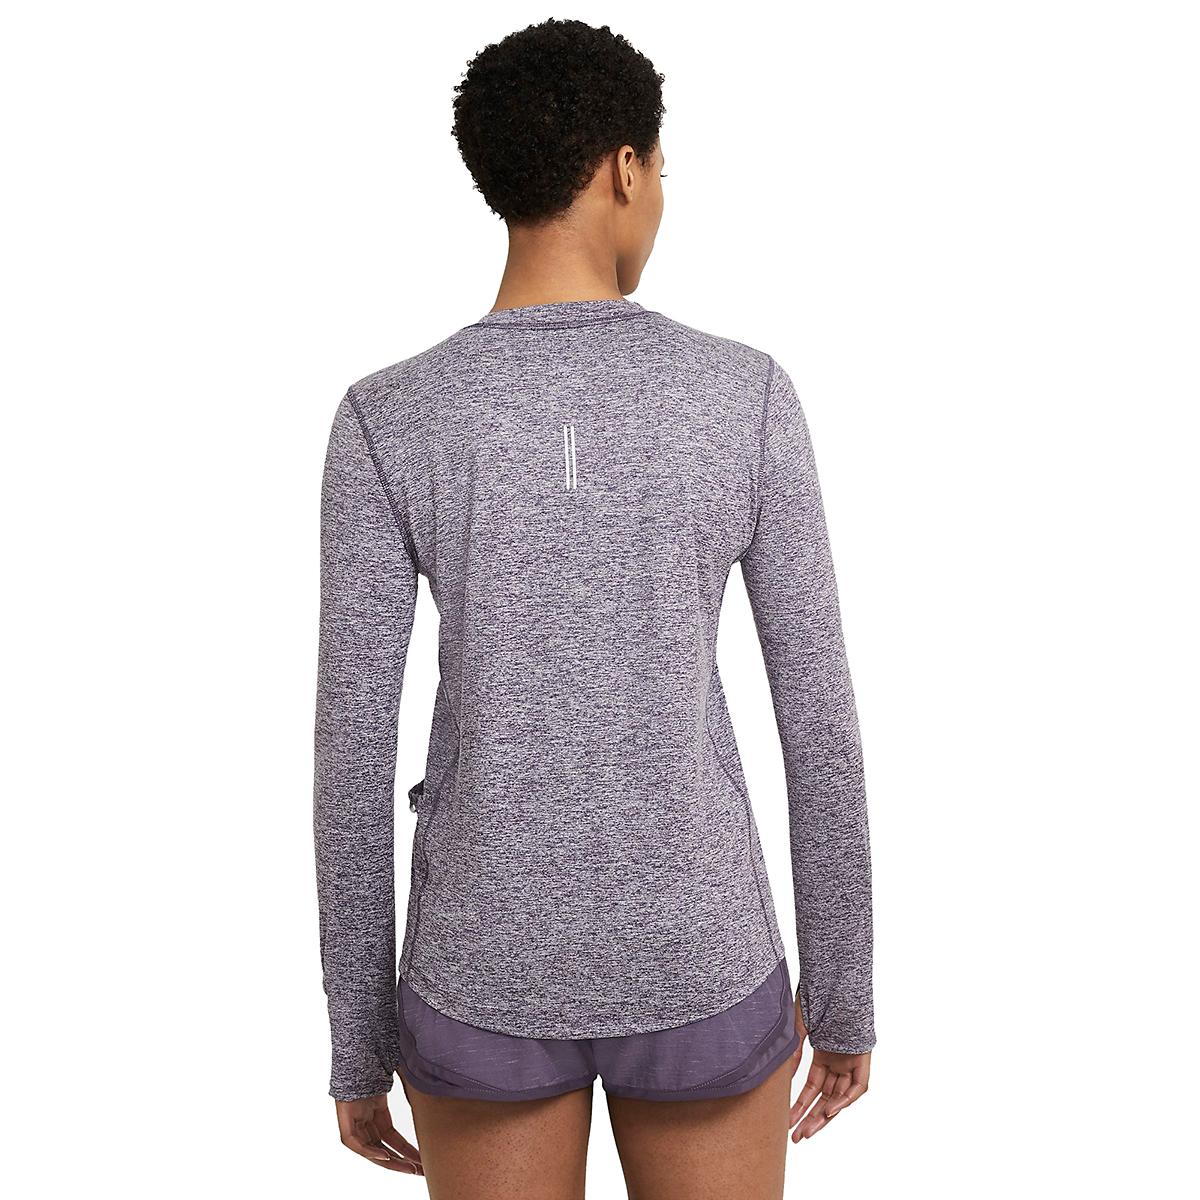 Women's Nike Element Crew Long Sleeve - Color: Dark Raisin/Light Violet/Reflective Silver - Size: XS, Dark Raisin/Light Violet/Reflective Silver, large, image 3